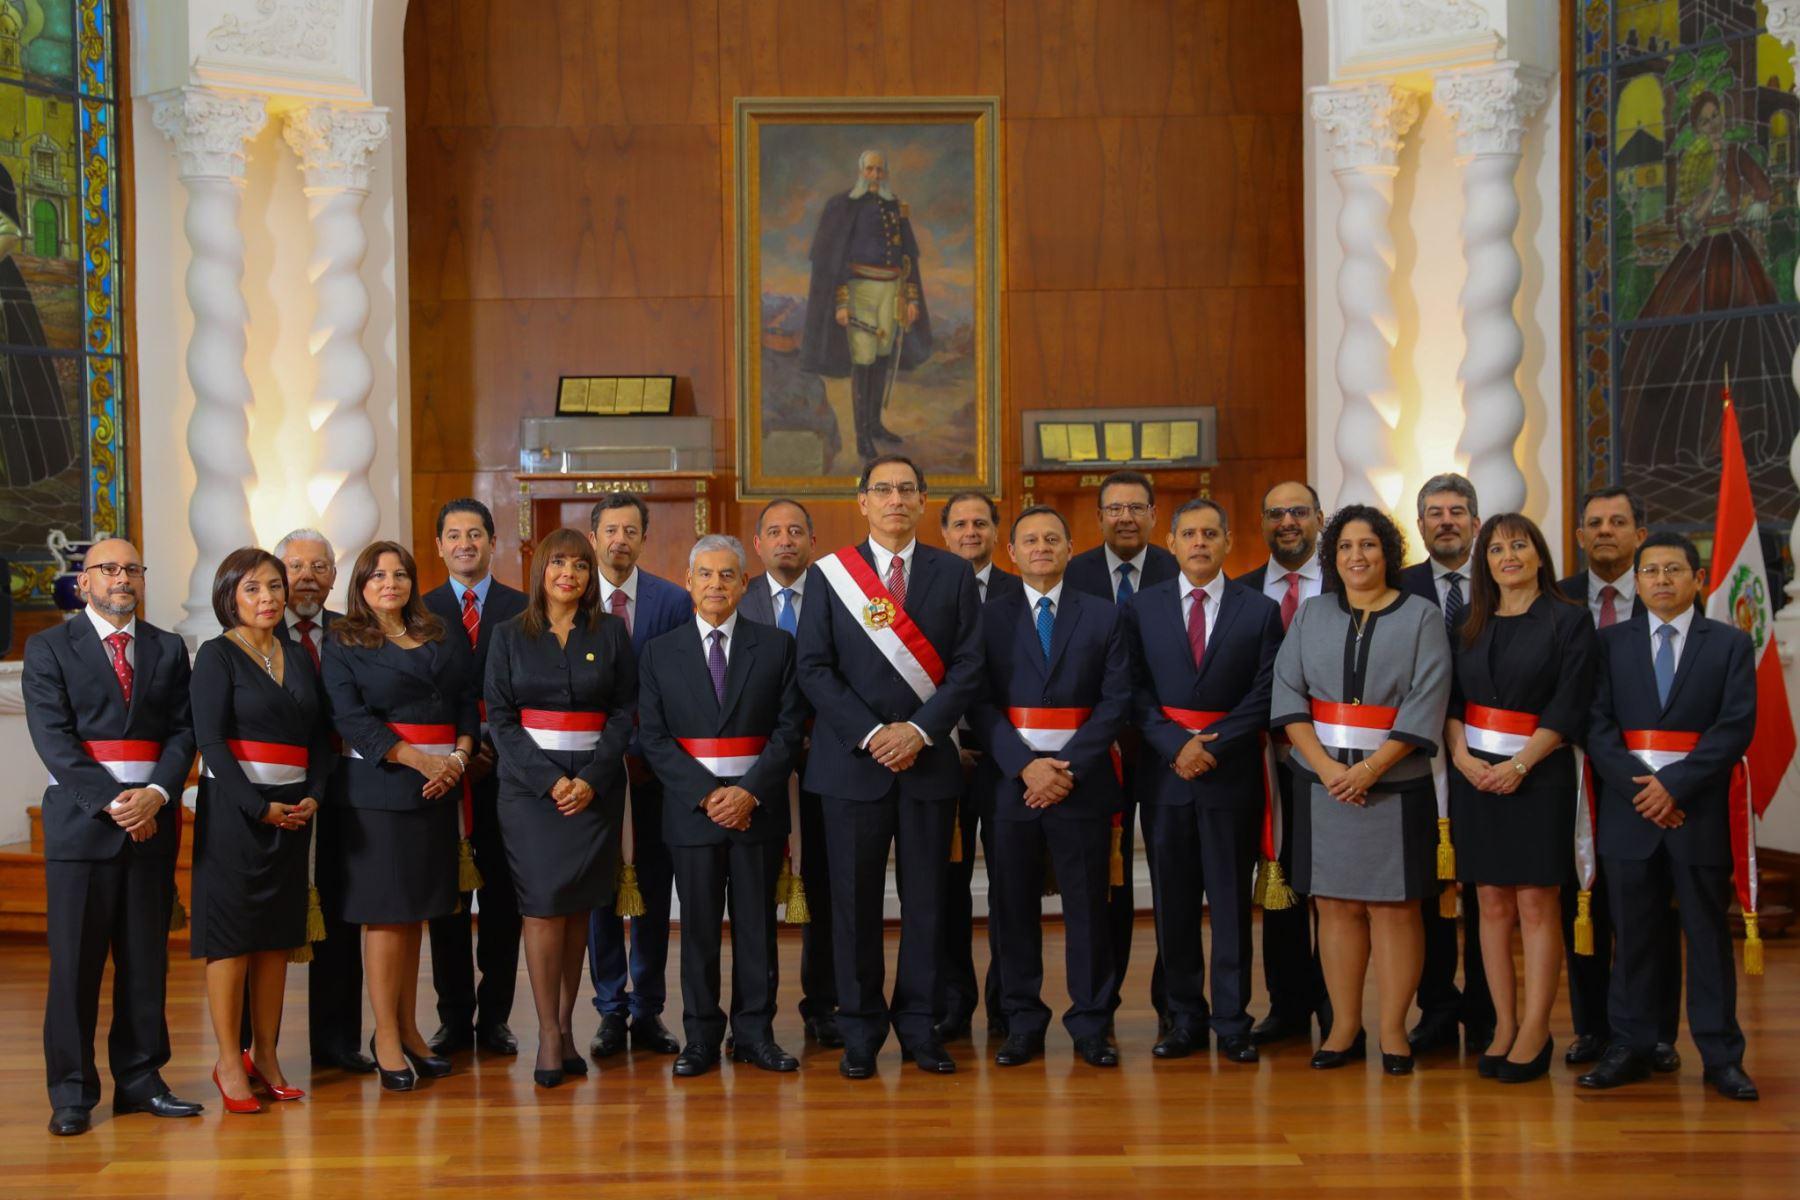 Presidente Vizcarra toma juramento a nuevo Gabinete encabezado por César Villanueva. Foto: ANDINA/ Andrés Valle